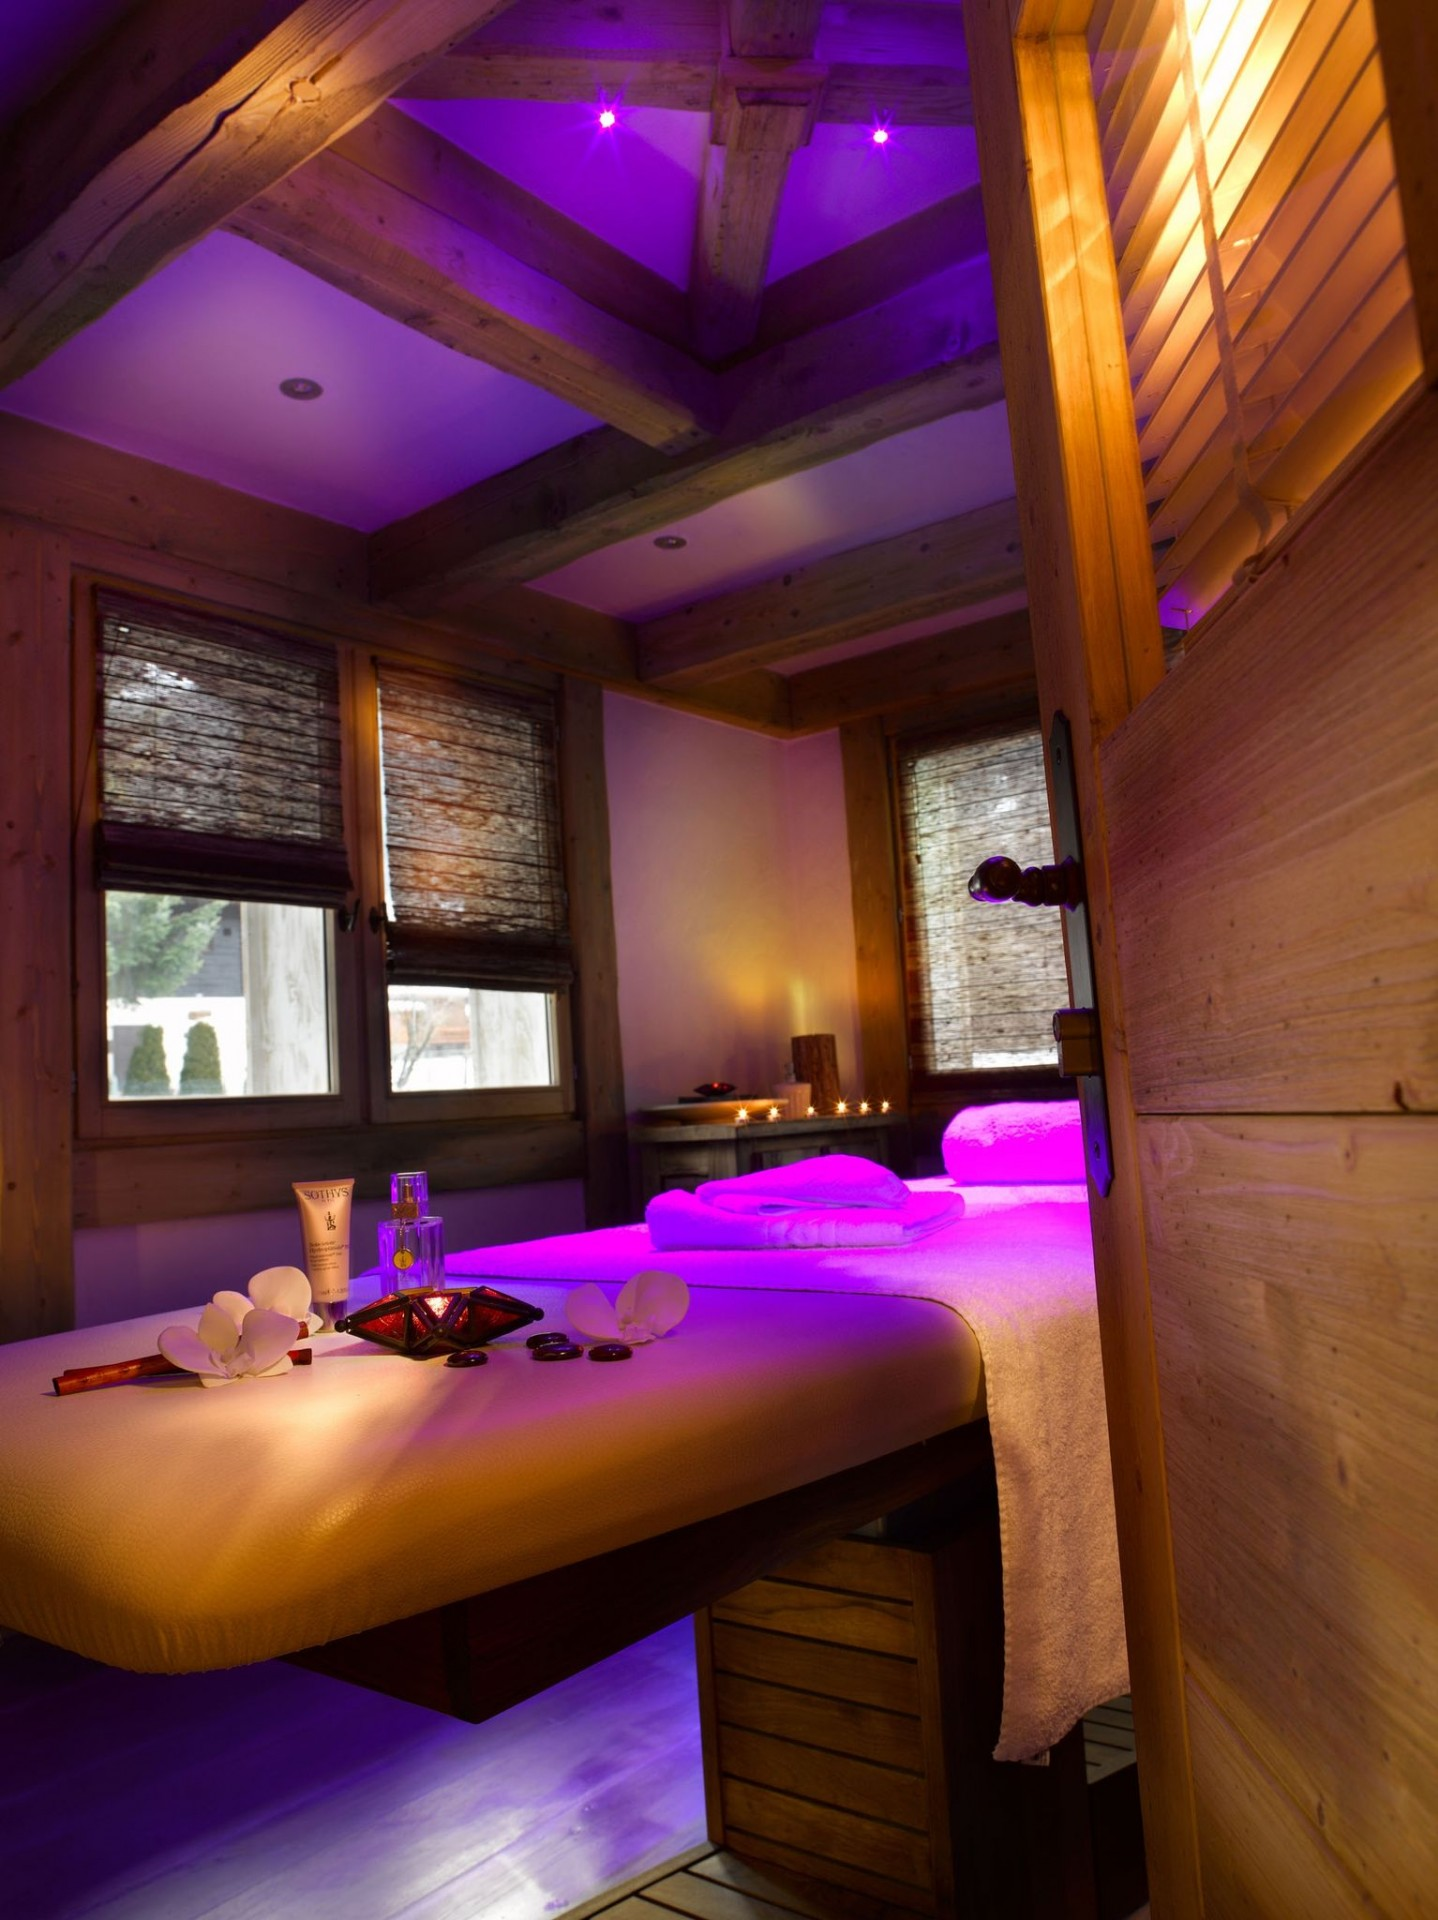 Les Houches Location Appartement Luxe Jacinthe Massage